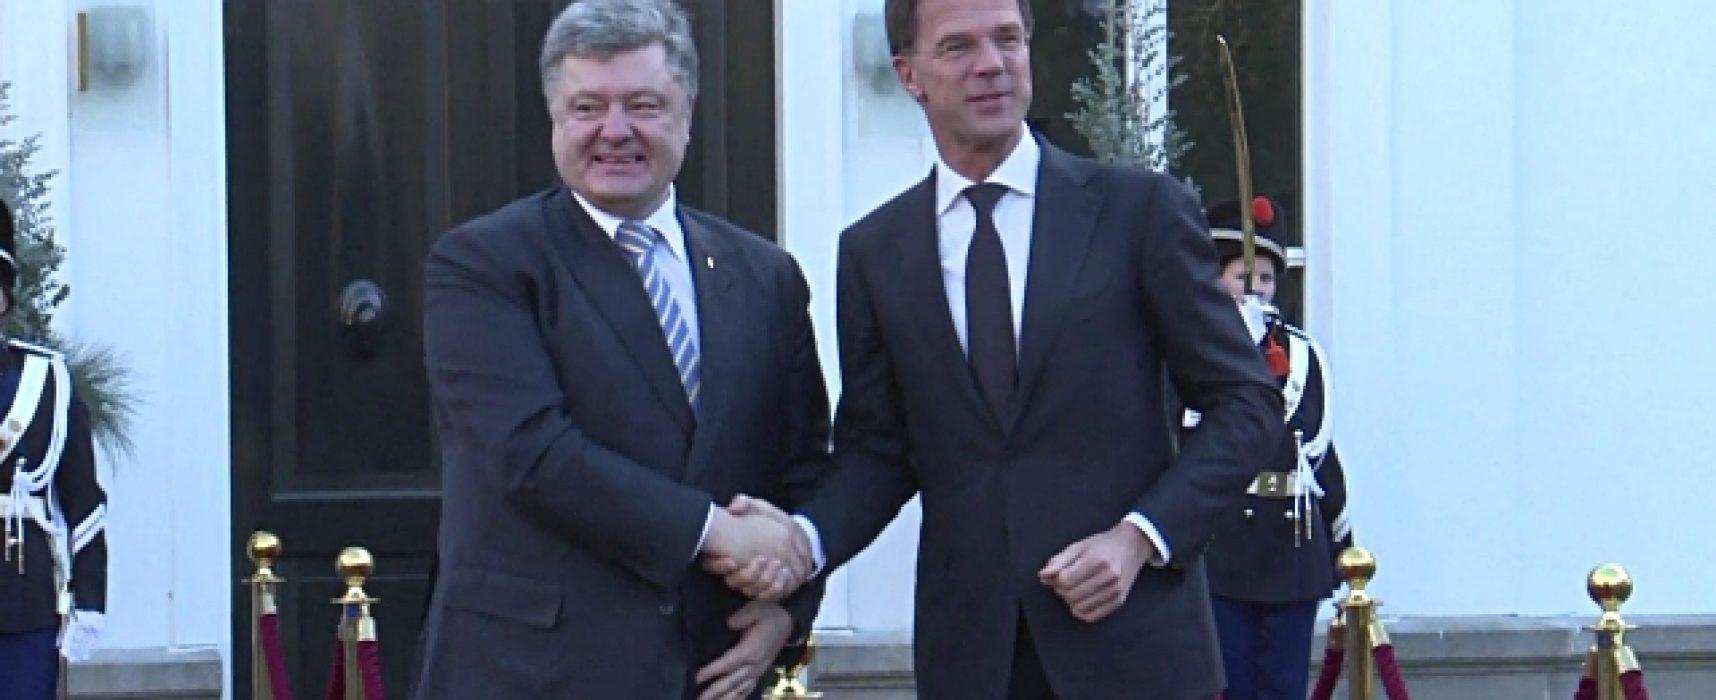 Invloedrijke adviesraad wil dat kabinet Oekraïneverdrag tekent, ondanks nee-stem